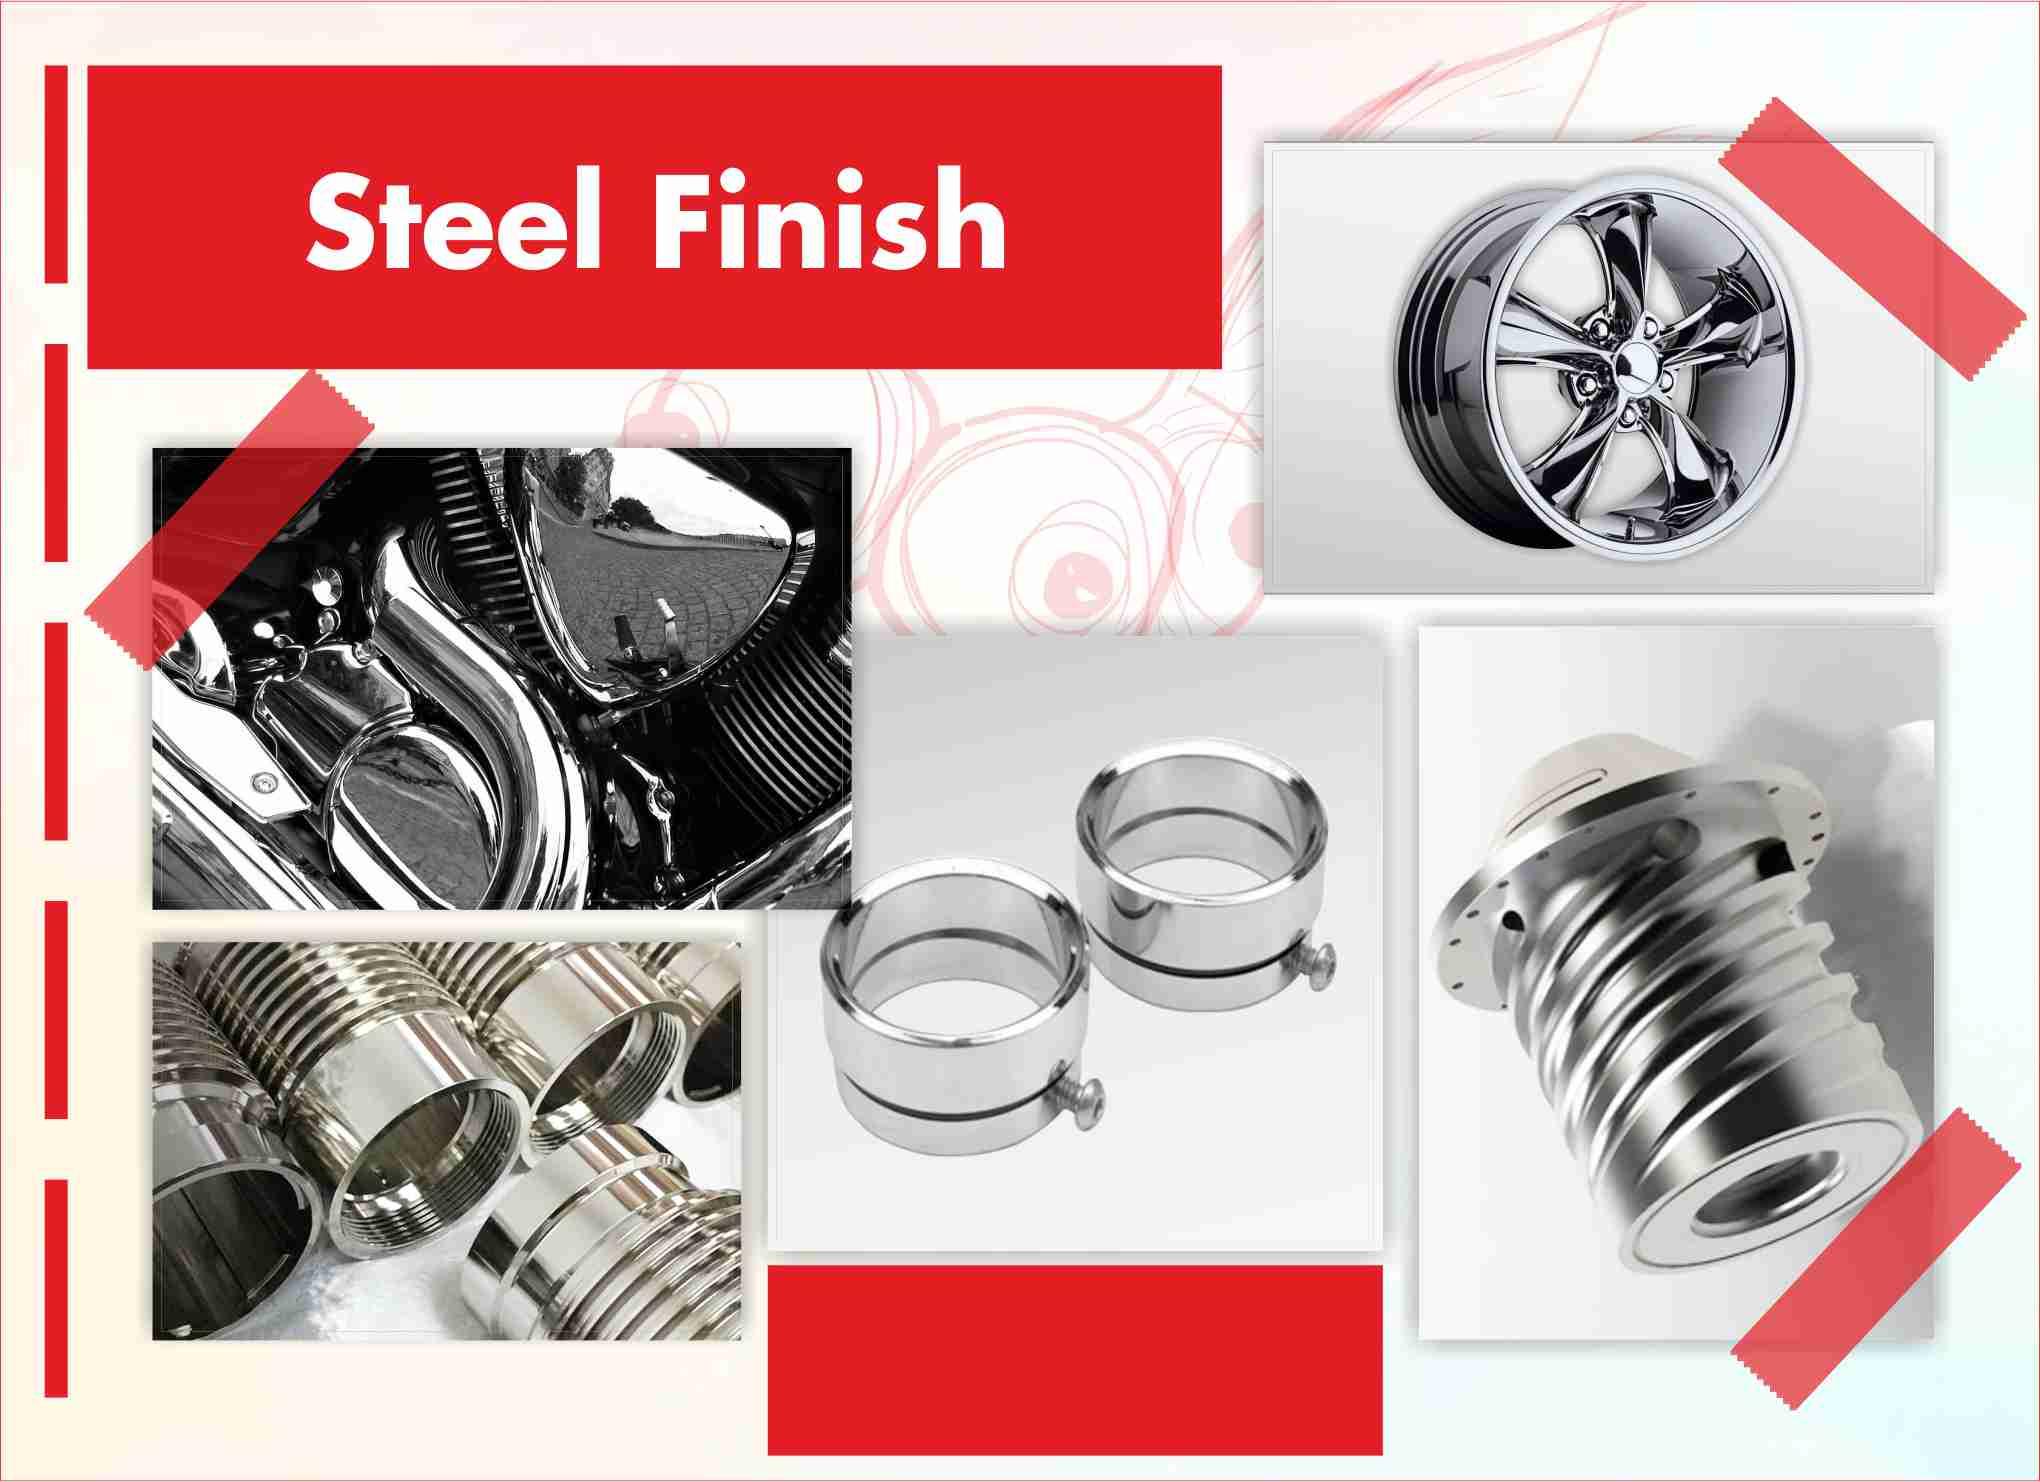 Steel Finish